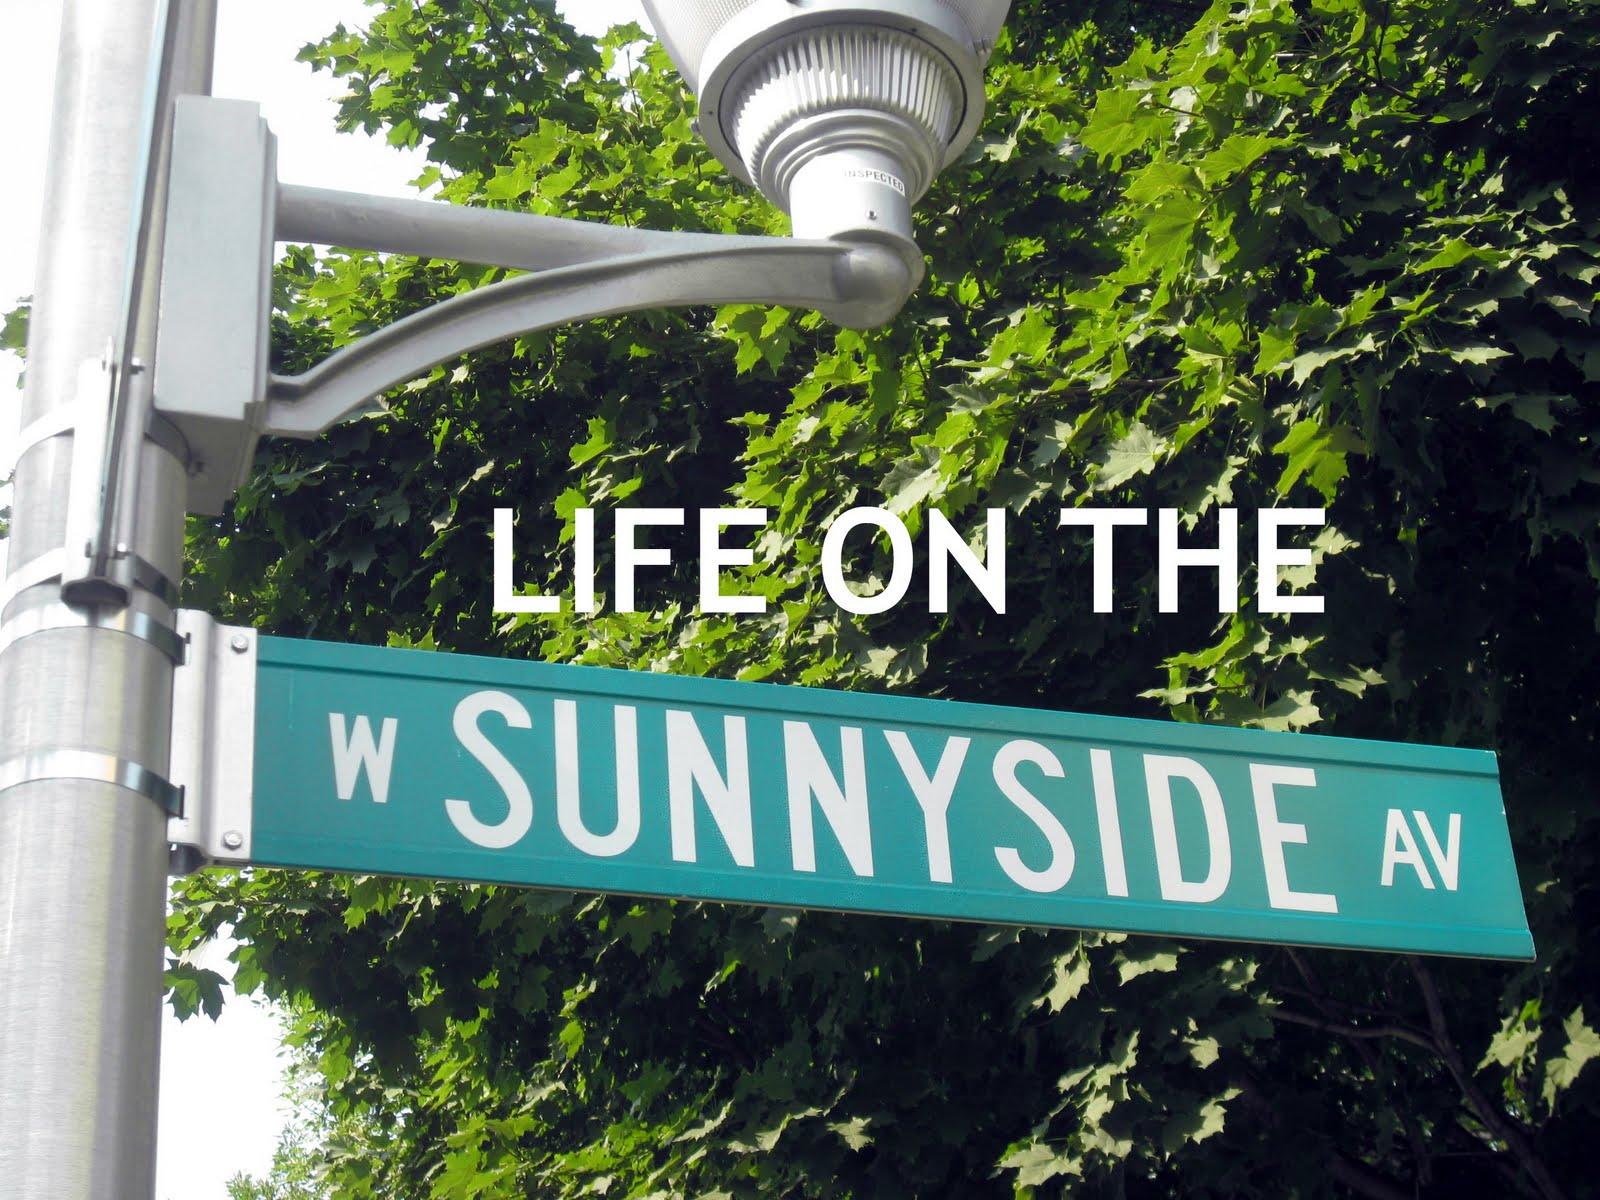 Life on the Sunnyside.